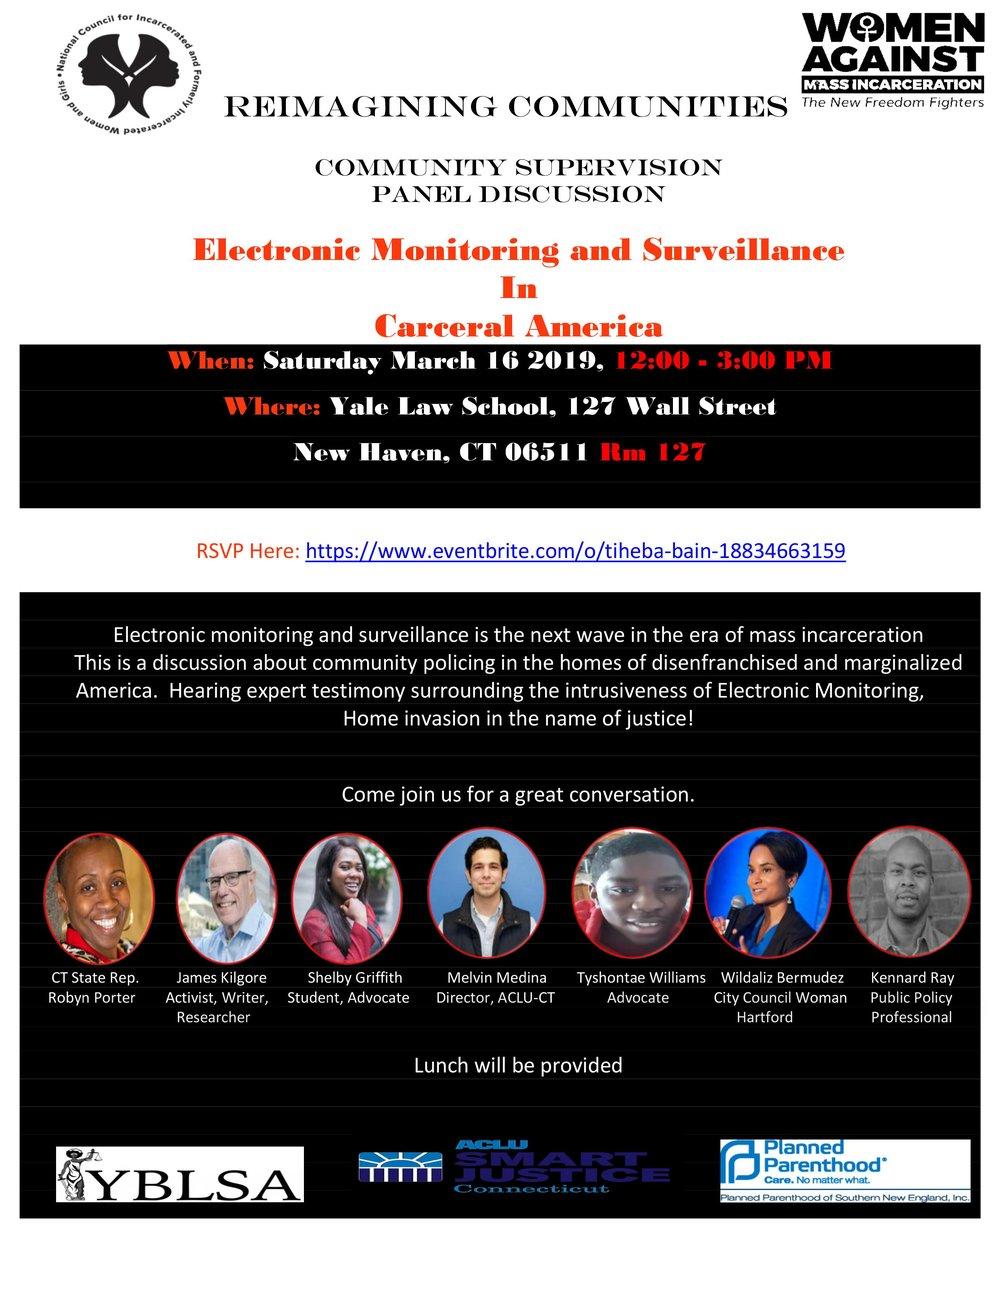 event_flyer-electronic-surveillance_03162019.jpg